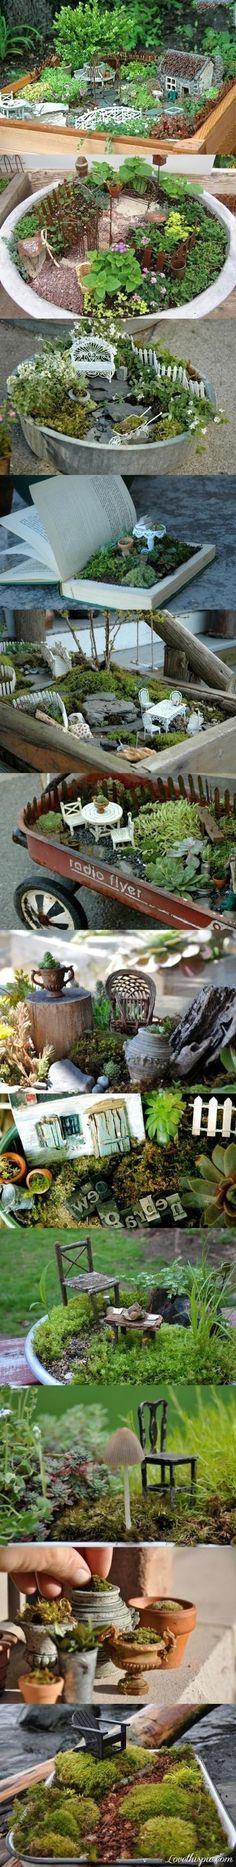 Make your garden to look beautiful